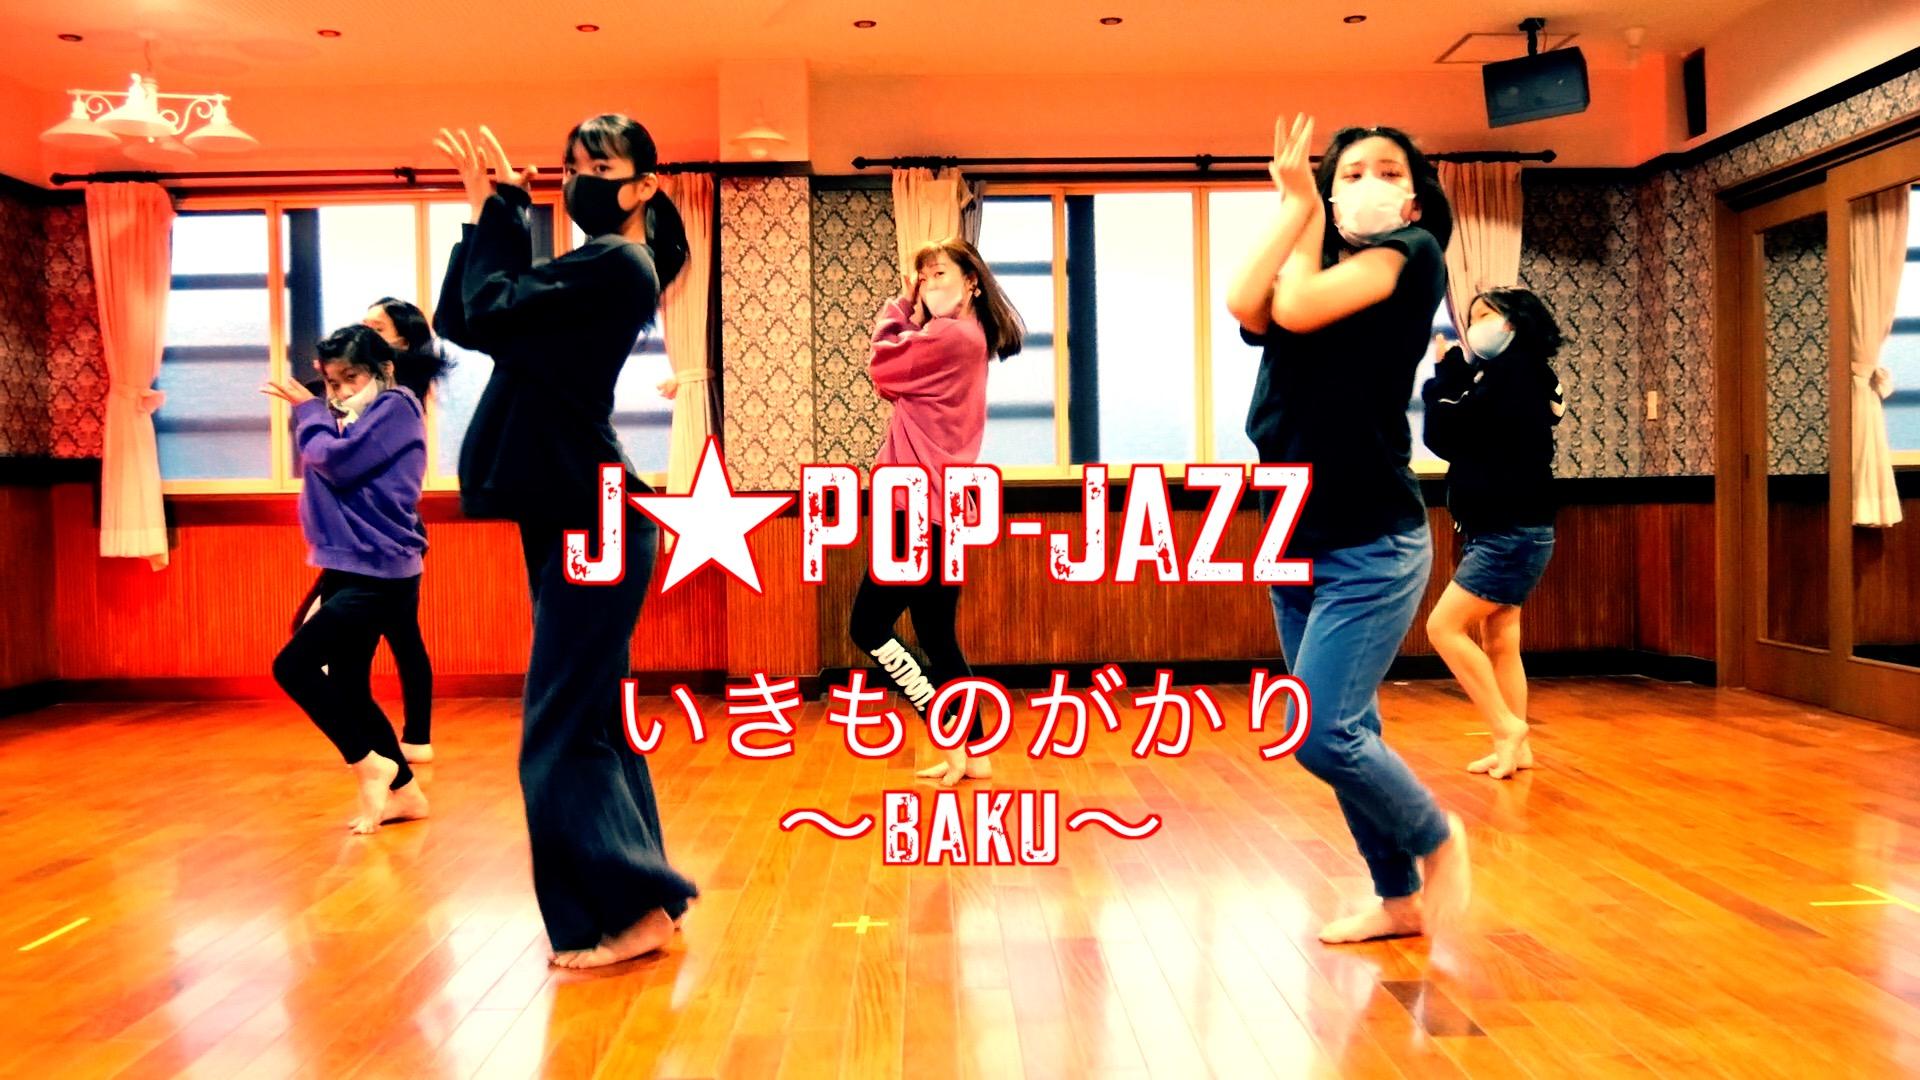 Jpop/KPop中心のジャズクラス「JPOP-JAZZ」